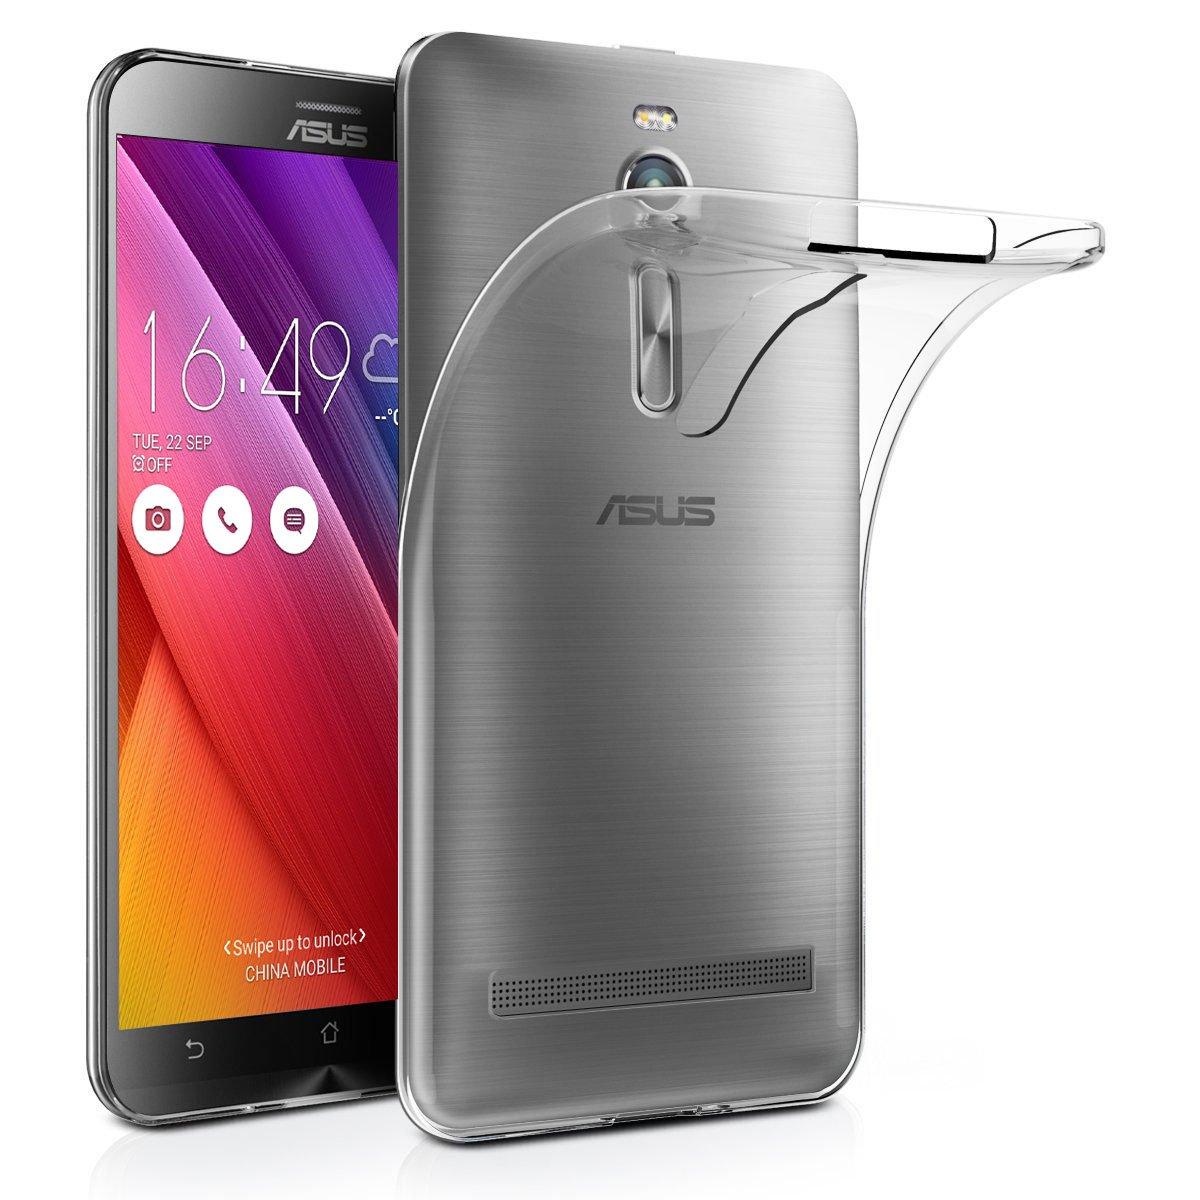 Funda Asus Zenfone Go ZB500KL, Leathlux Trasparente Suave Silicona Carcasa Protector Bumper Tapa Claro Flexible TPU Gel Ultra Delgado Cubierta para ...